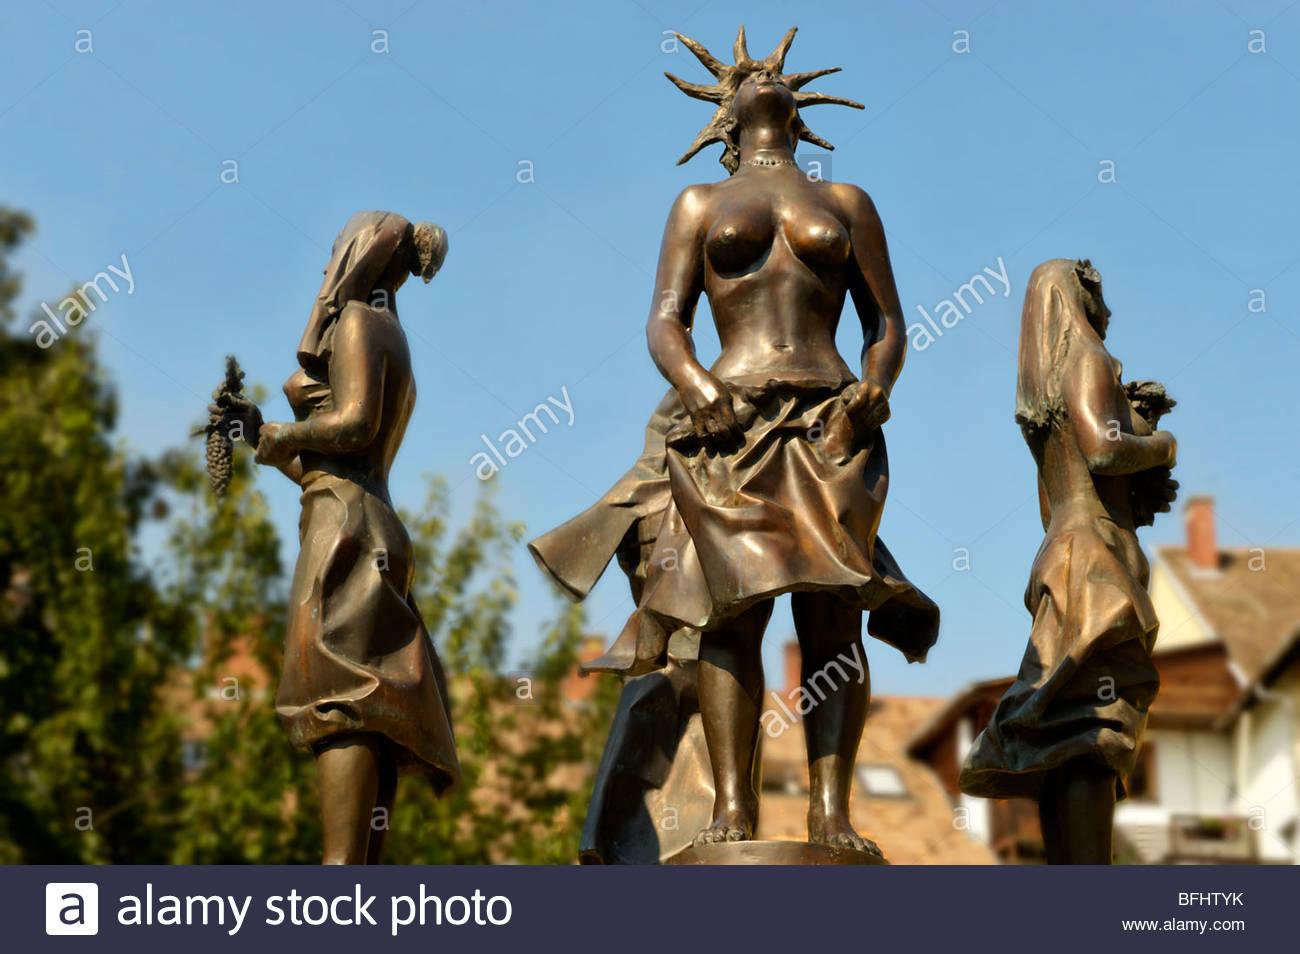 Statue of the four seasons - Tapolca, Balaton, Hungary - Stock Image